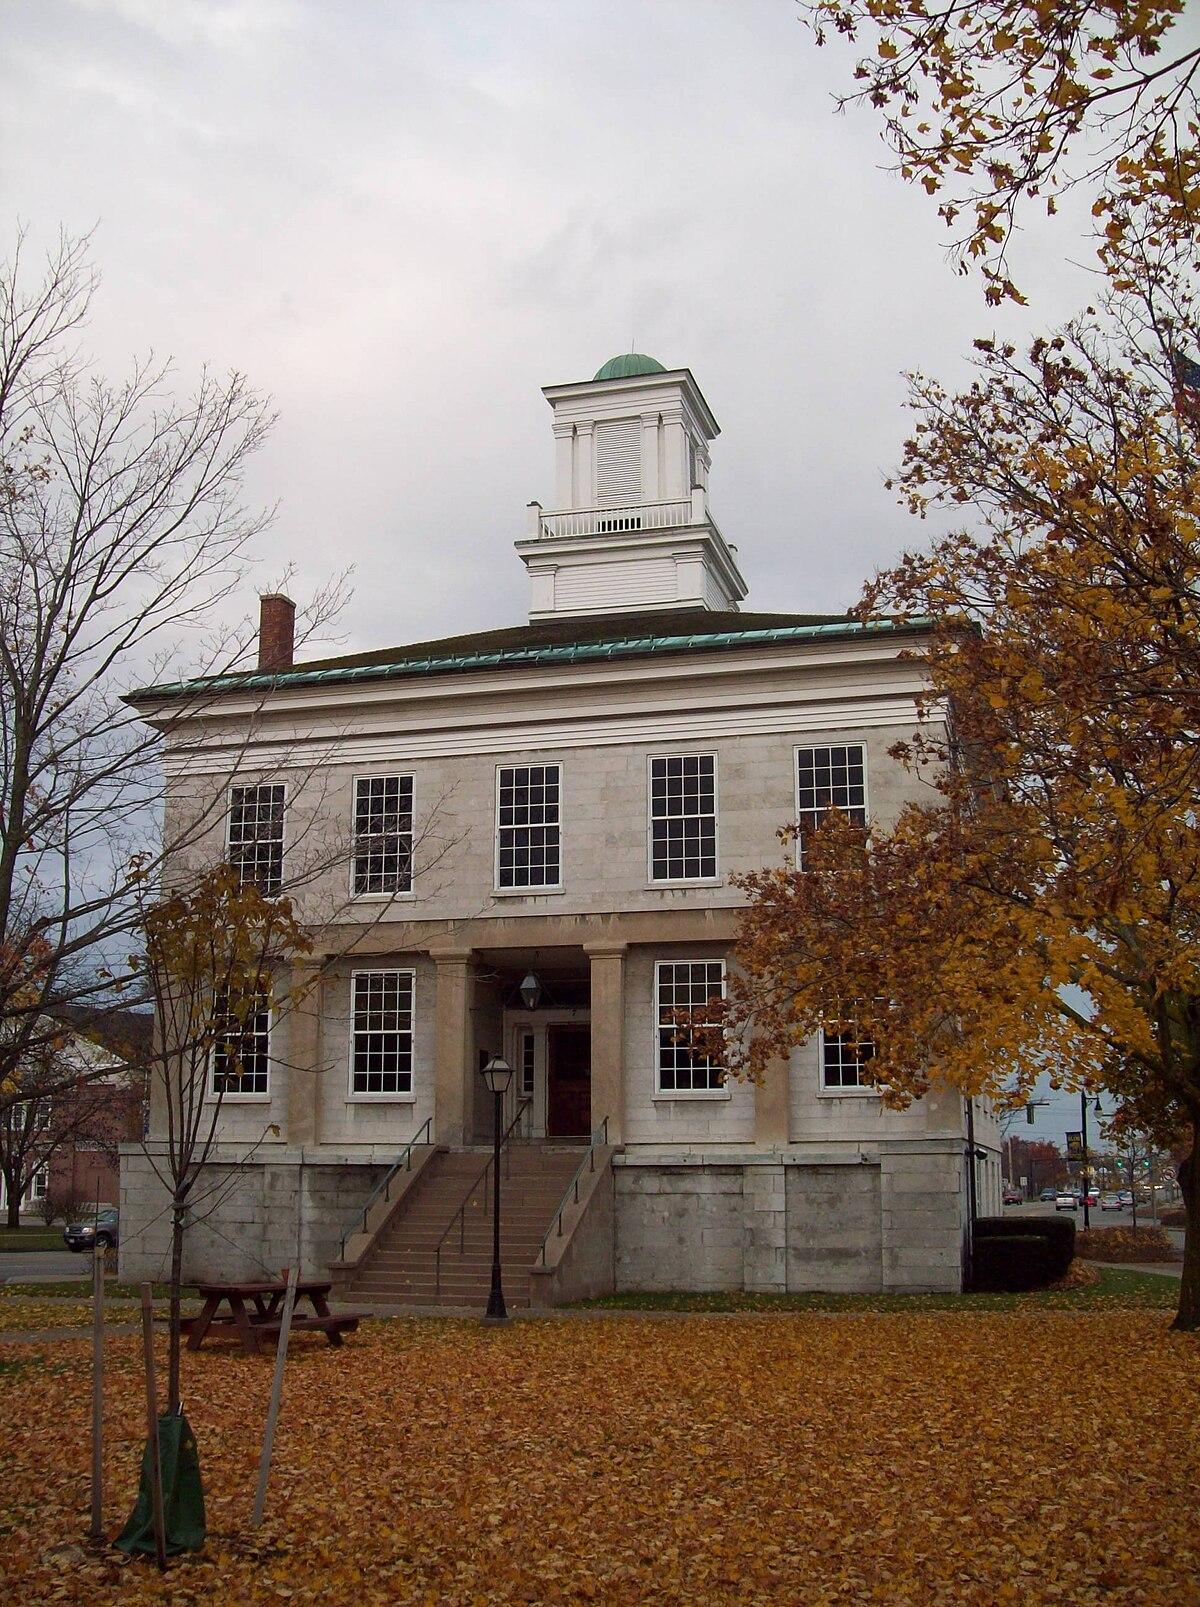 New york genesee county oakfield - New York Genesee County Oakfield 14